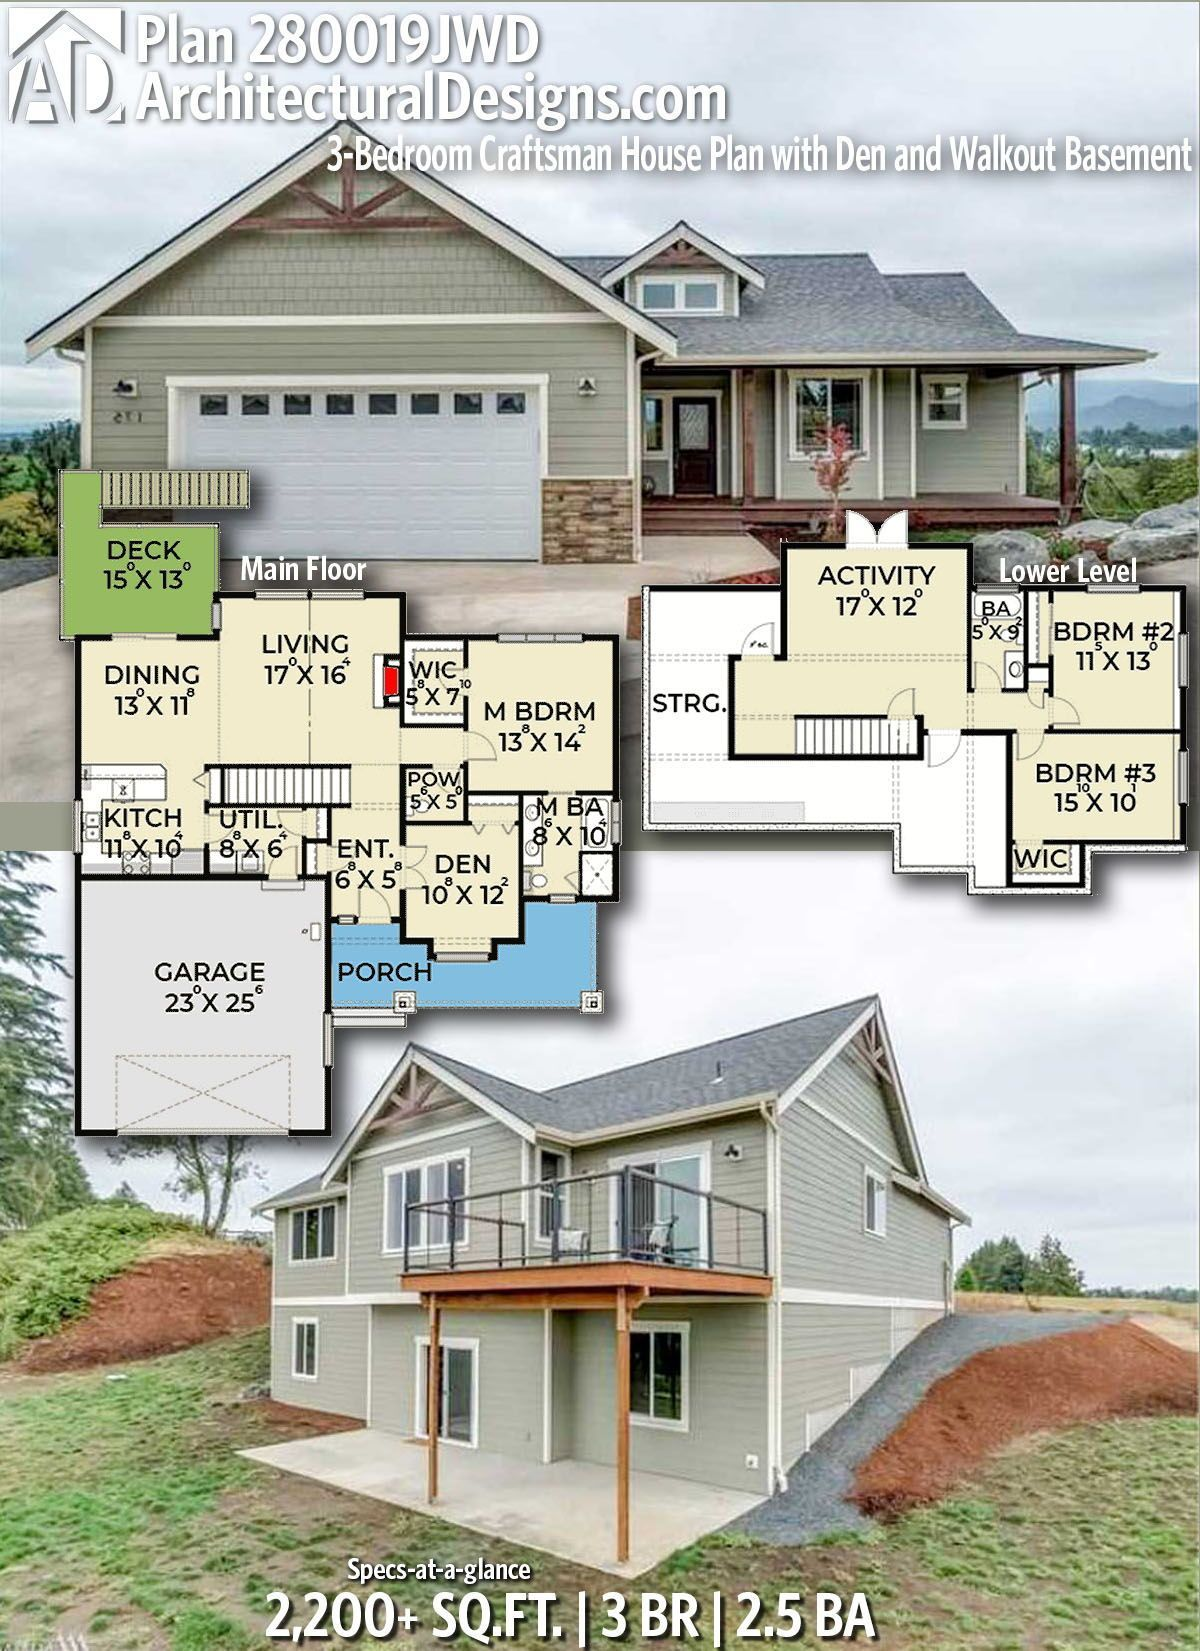 17 Surprising Cottage Home Plans Walkout Basement To Make Your Home Plans Beautiful Basement House Plans Craftsman House Craftsman House Plans